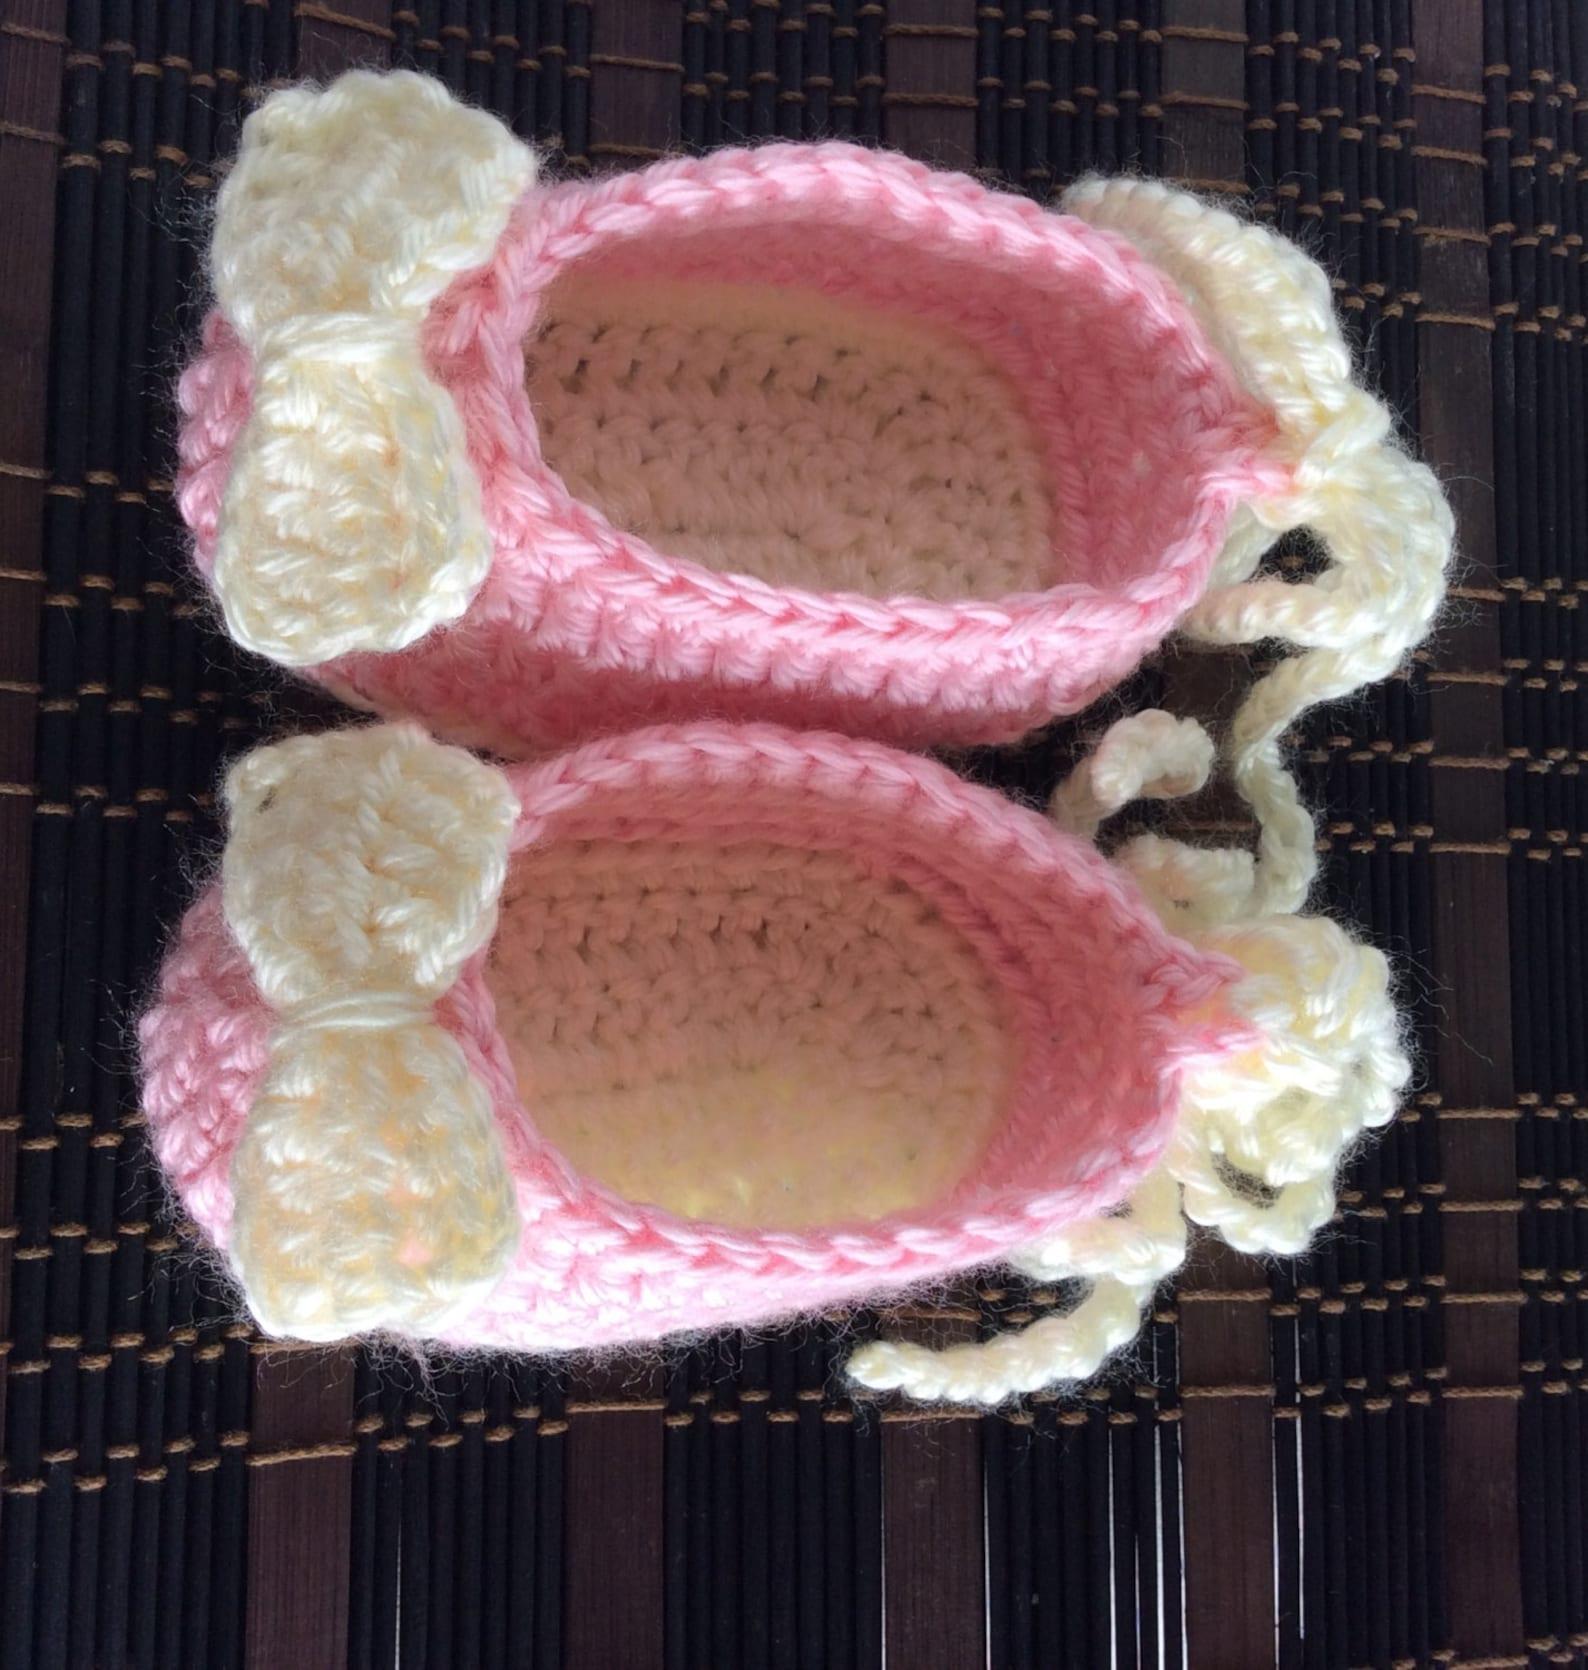 baby girl ballerina shoes.ballet slippers.crochet ballet shoes for baby girls.baby shoes.baby sandals.summer shoes.crochet shoes